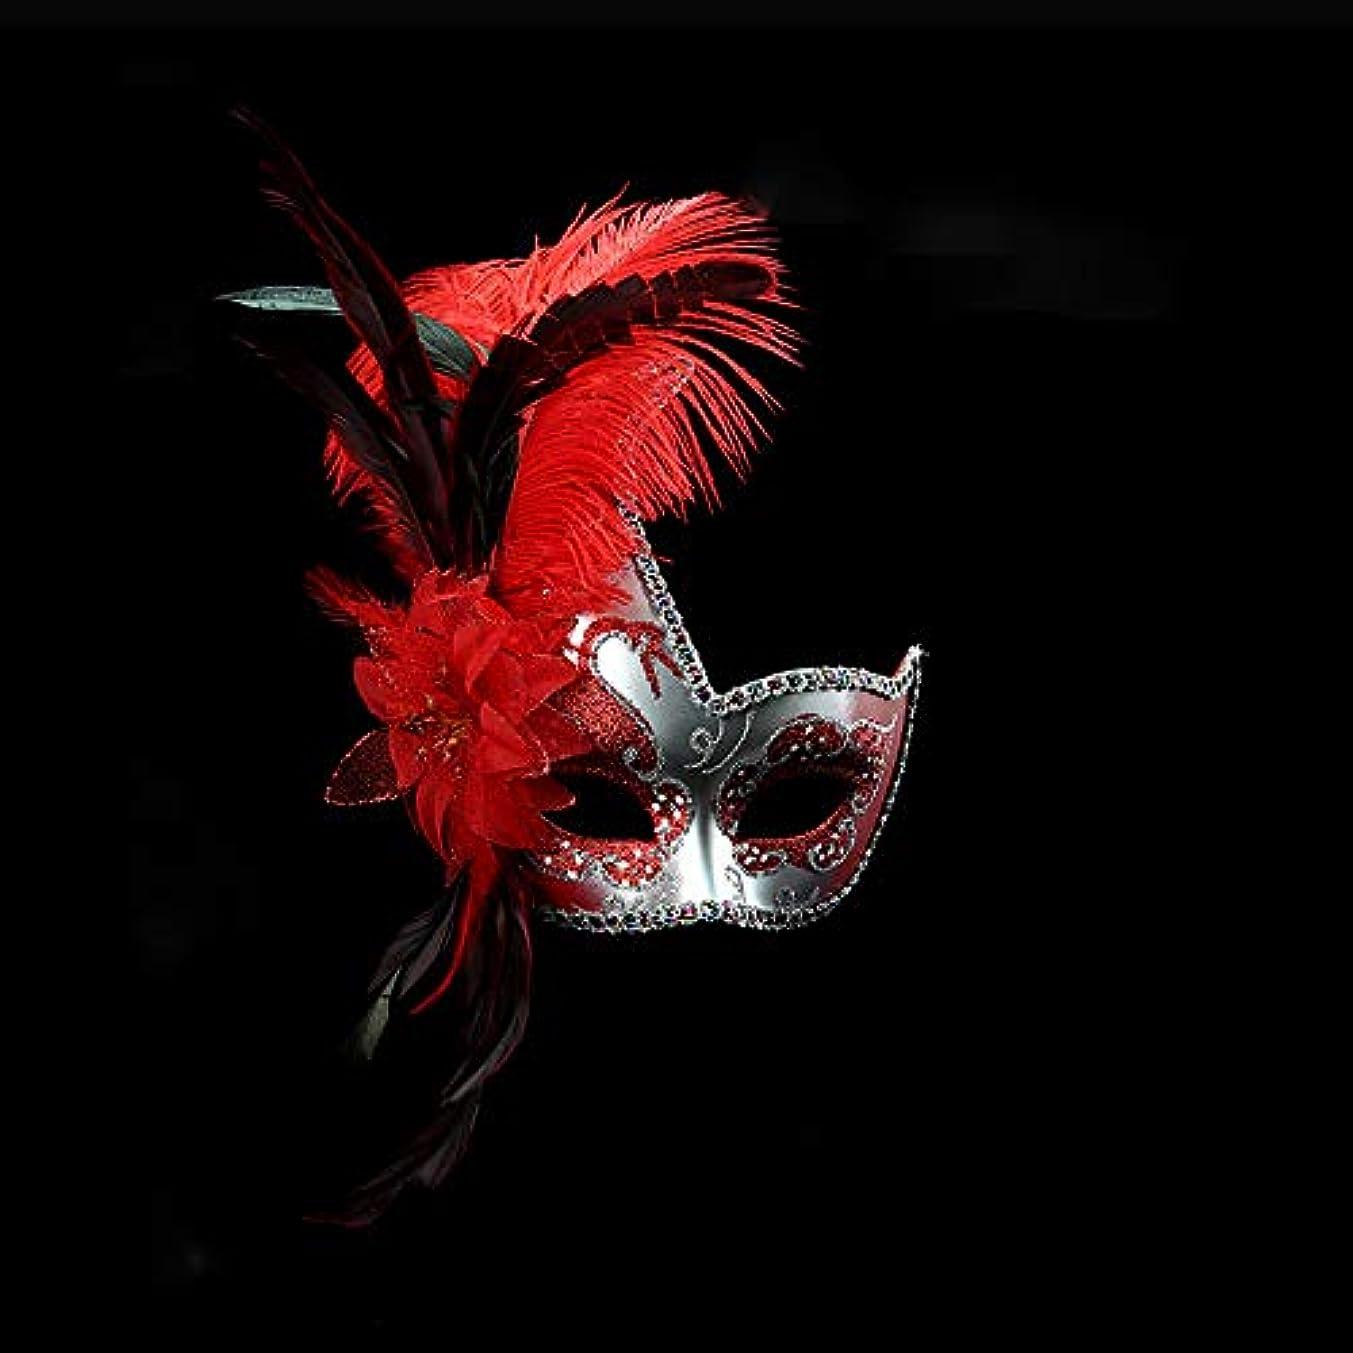 Nanle ハロウィンマスクハーフフェザーマスクベニスプリンセスマスク美容レース仮面ライダーコスプレ (色 : Red)